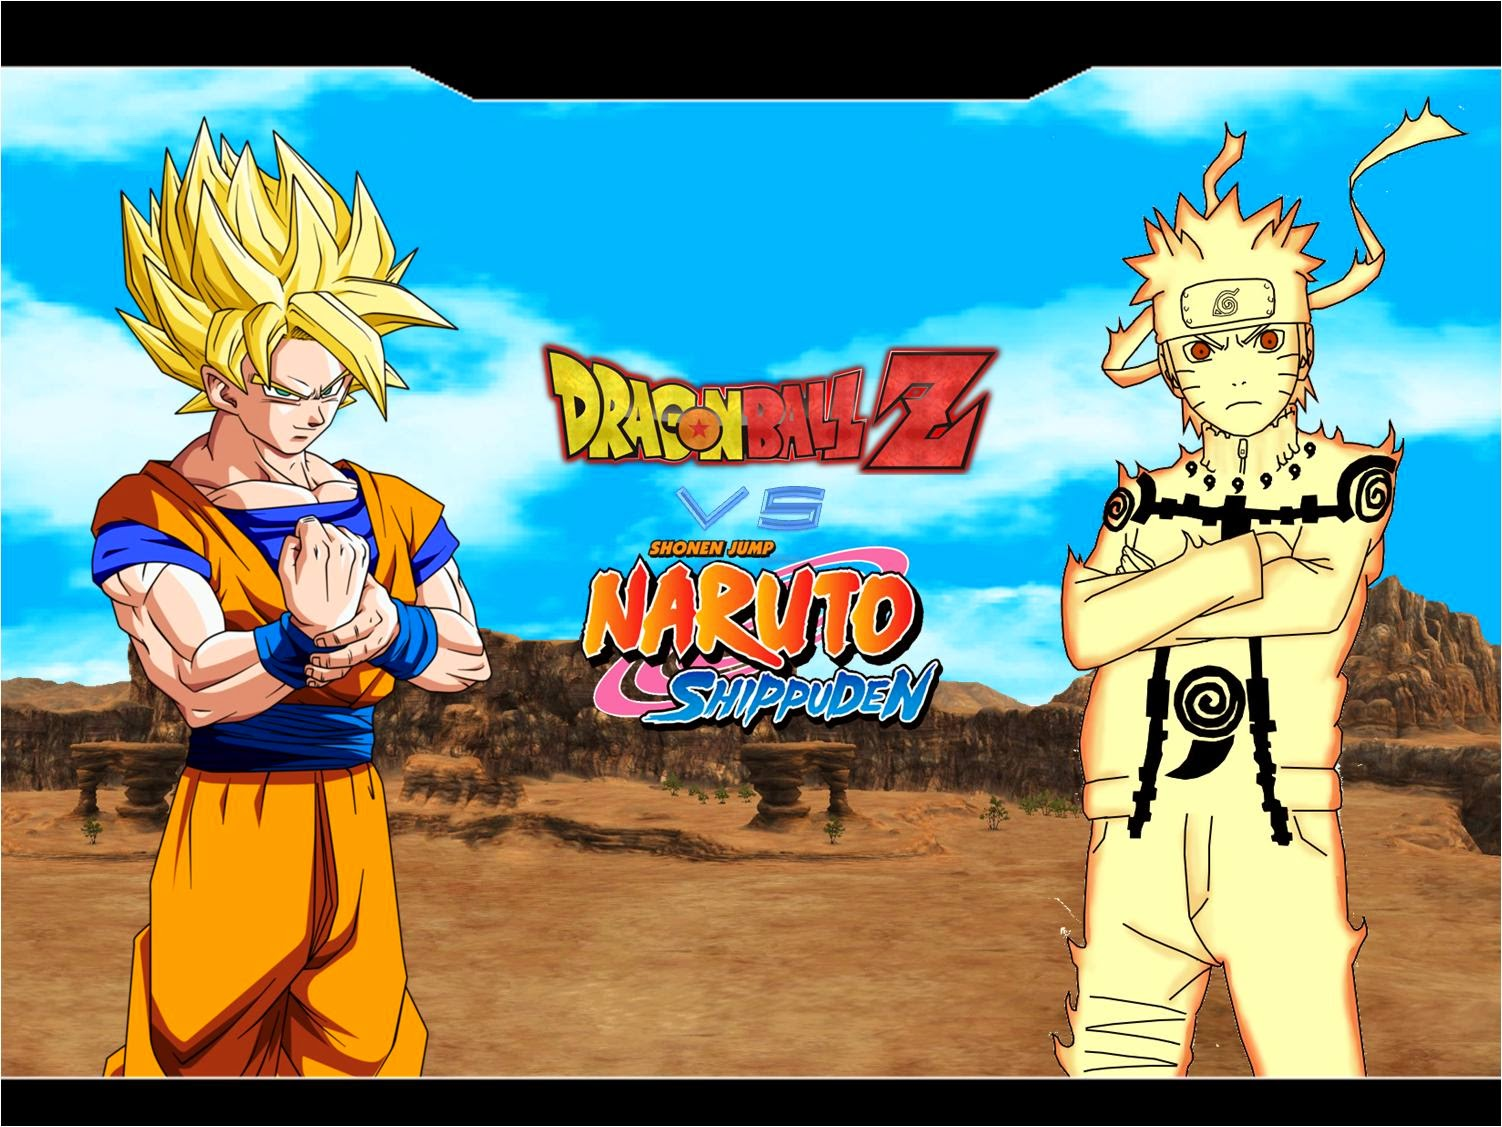 Dragon ball vs naruto 8